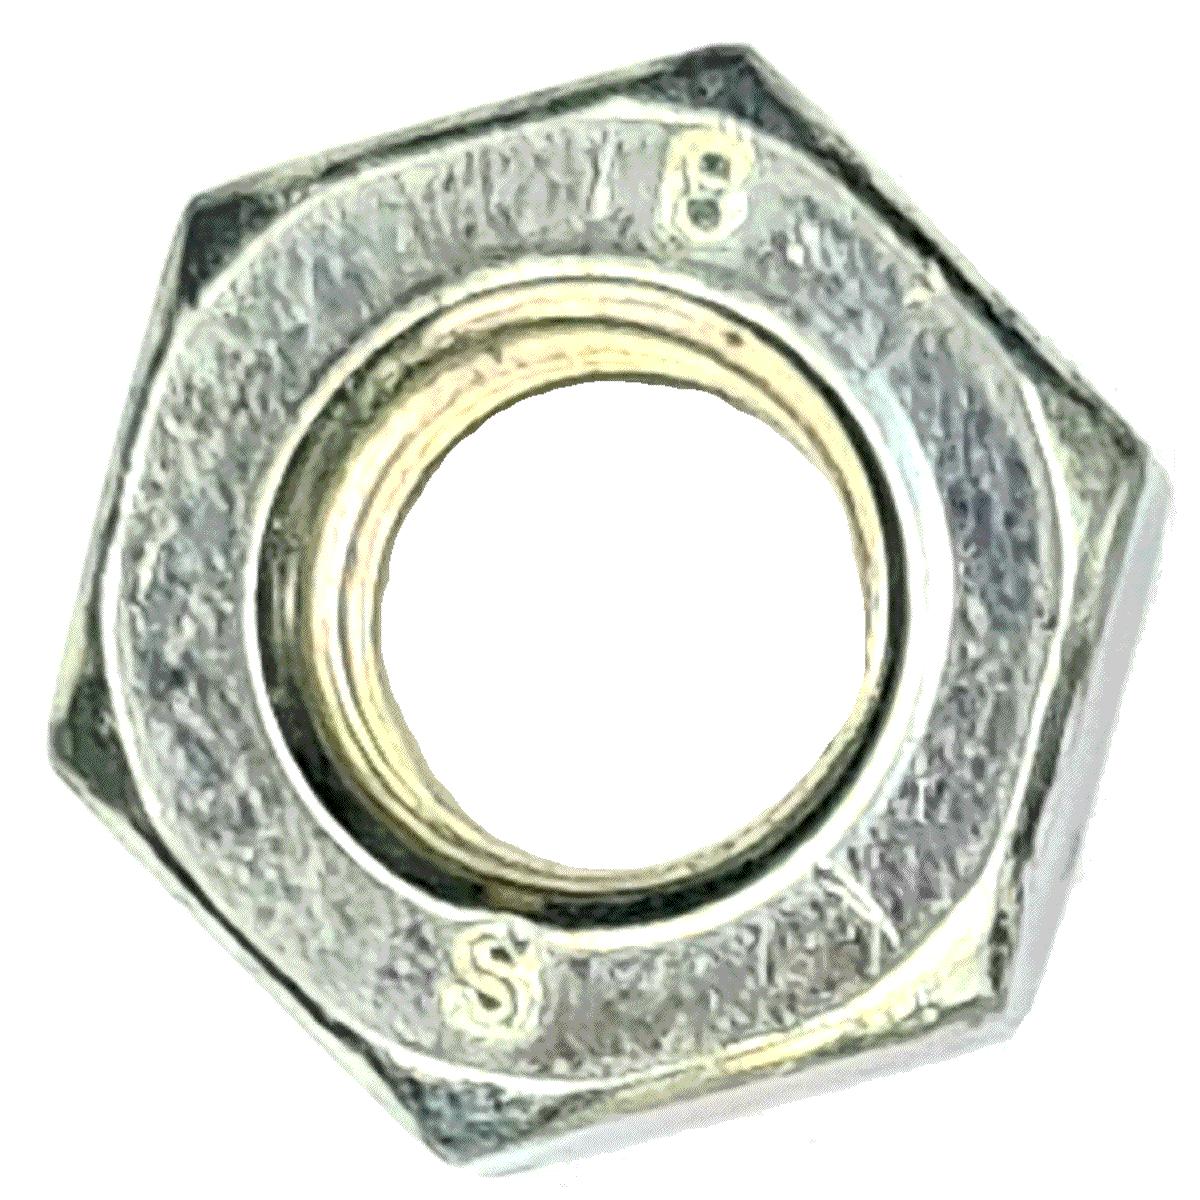 Porca Sextavada 10 mm MA 8.8 chave 16 mm